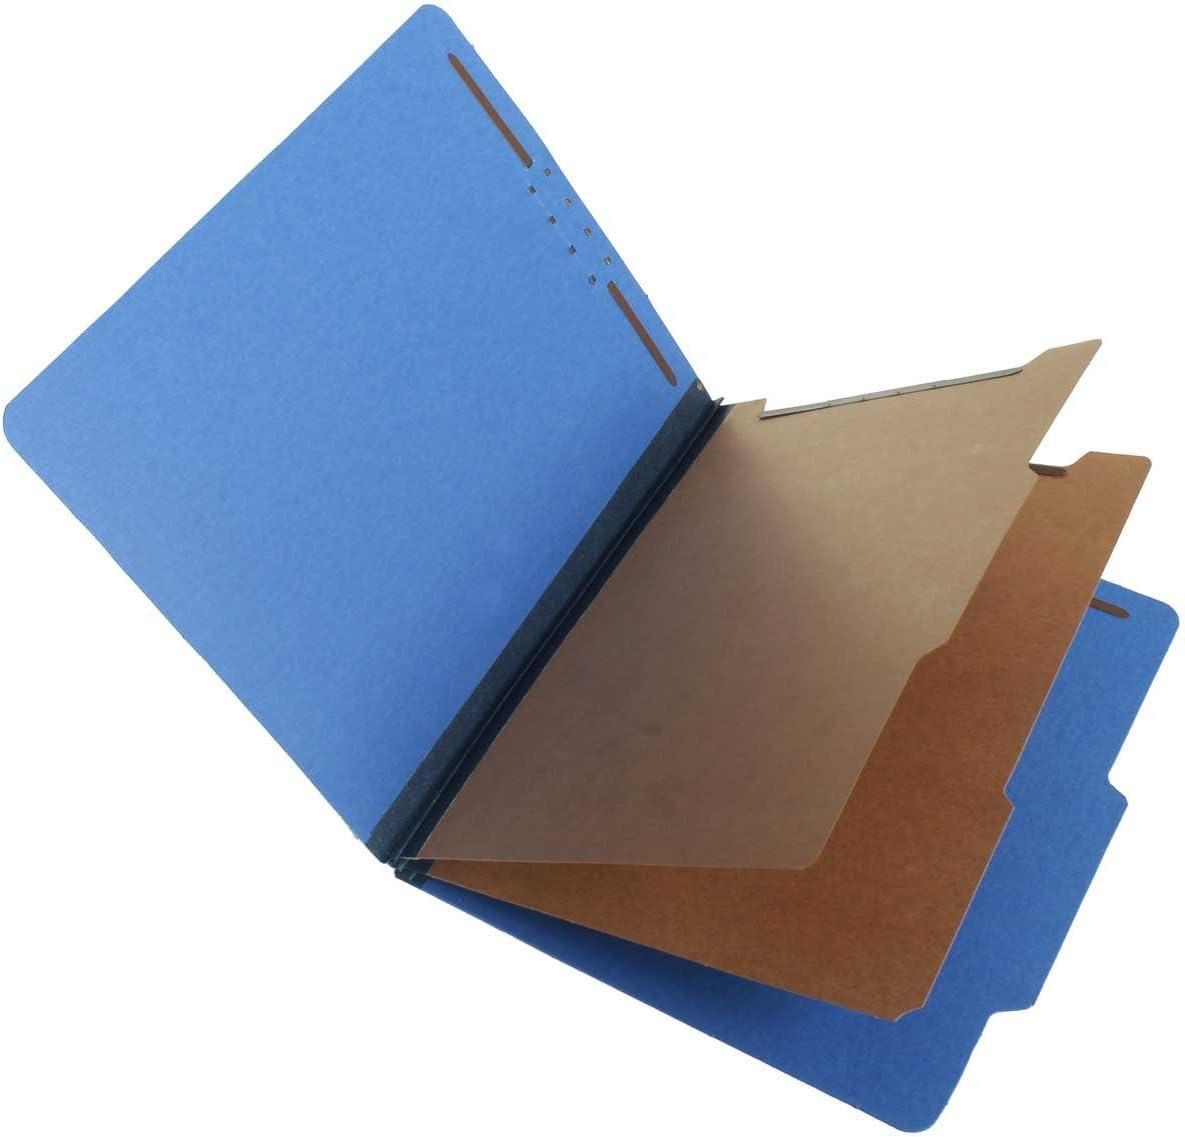 Royal Blue SJ Paper S60403 Match 25 Pt Pressboard Classification Folders Box of 15 2 Dividers 2//5 Cut ROC Top Tab Letter Size